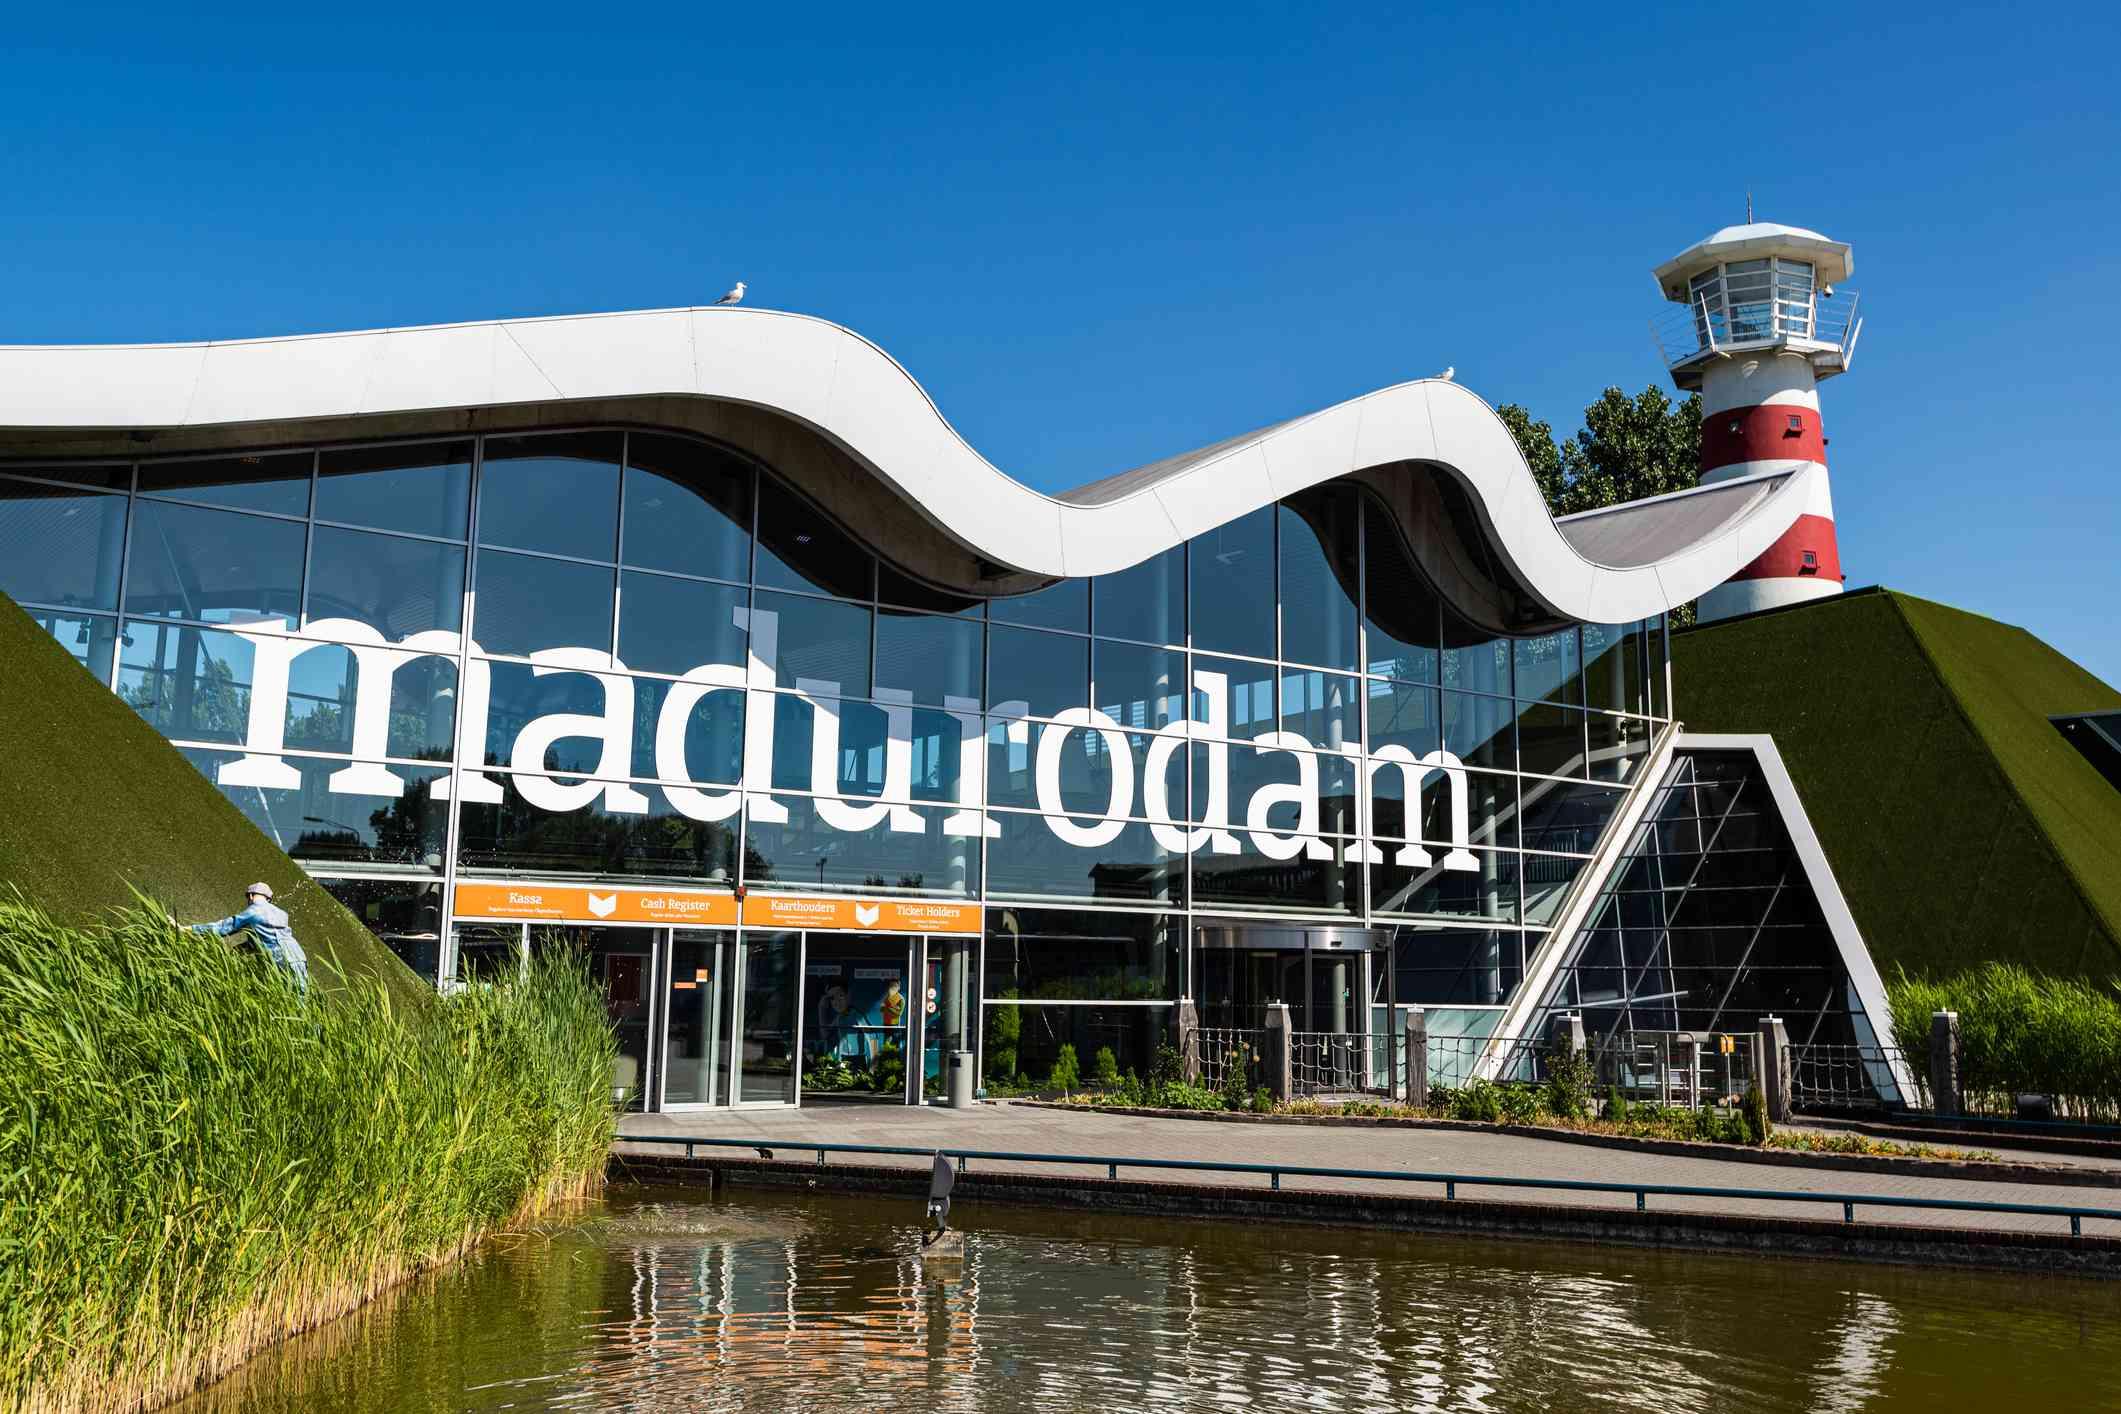 Entrance to Madurodam miniature city, The Hague, Netherlands, Europe